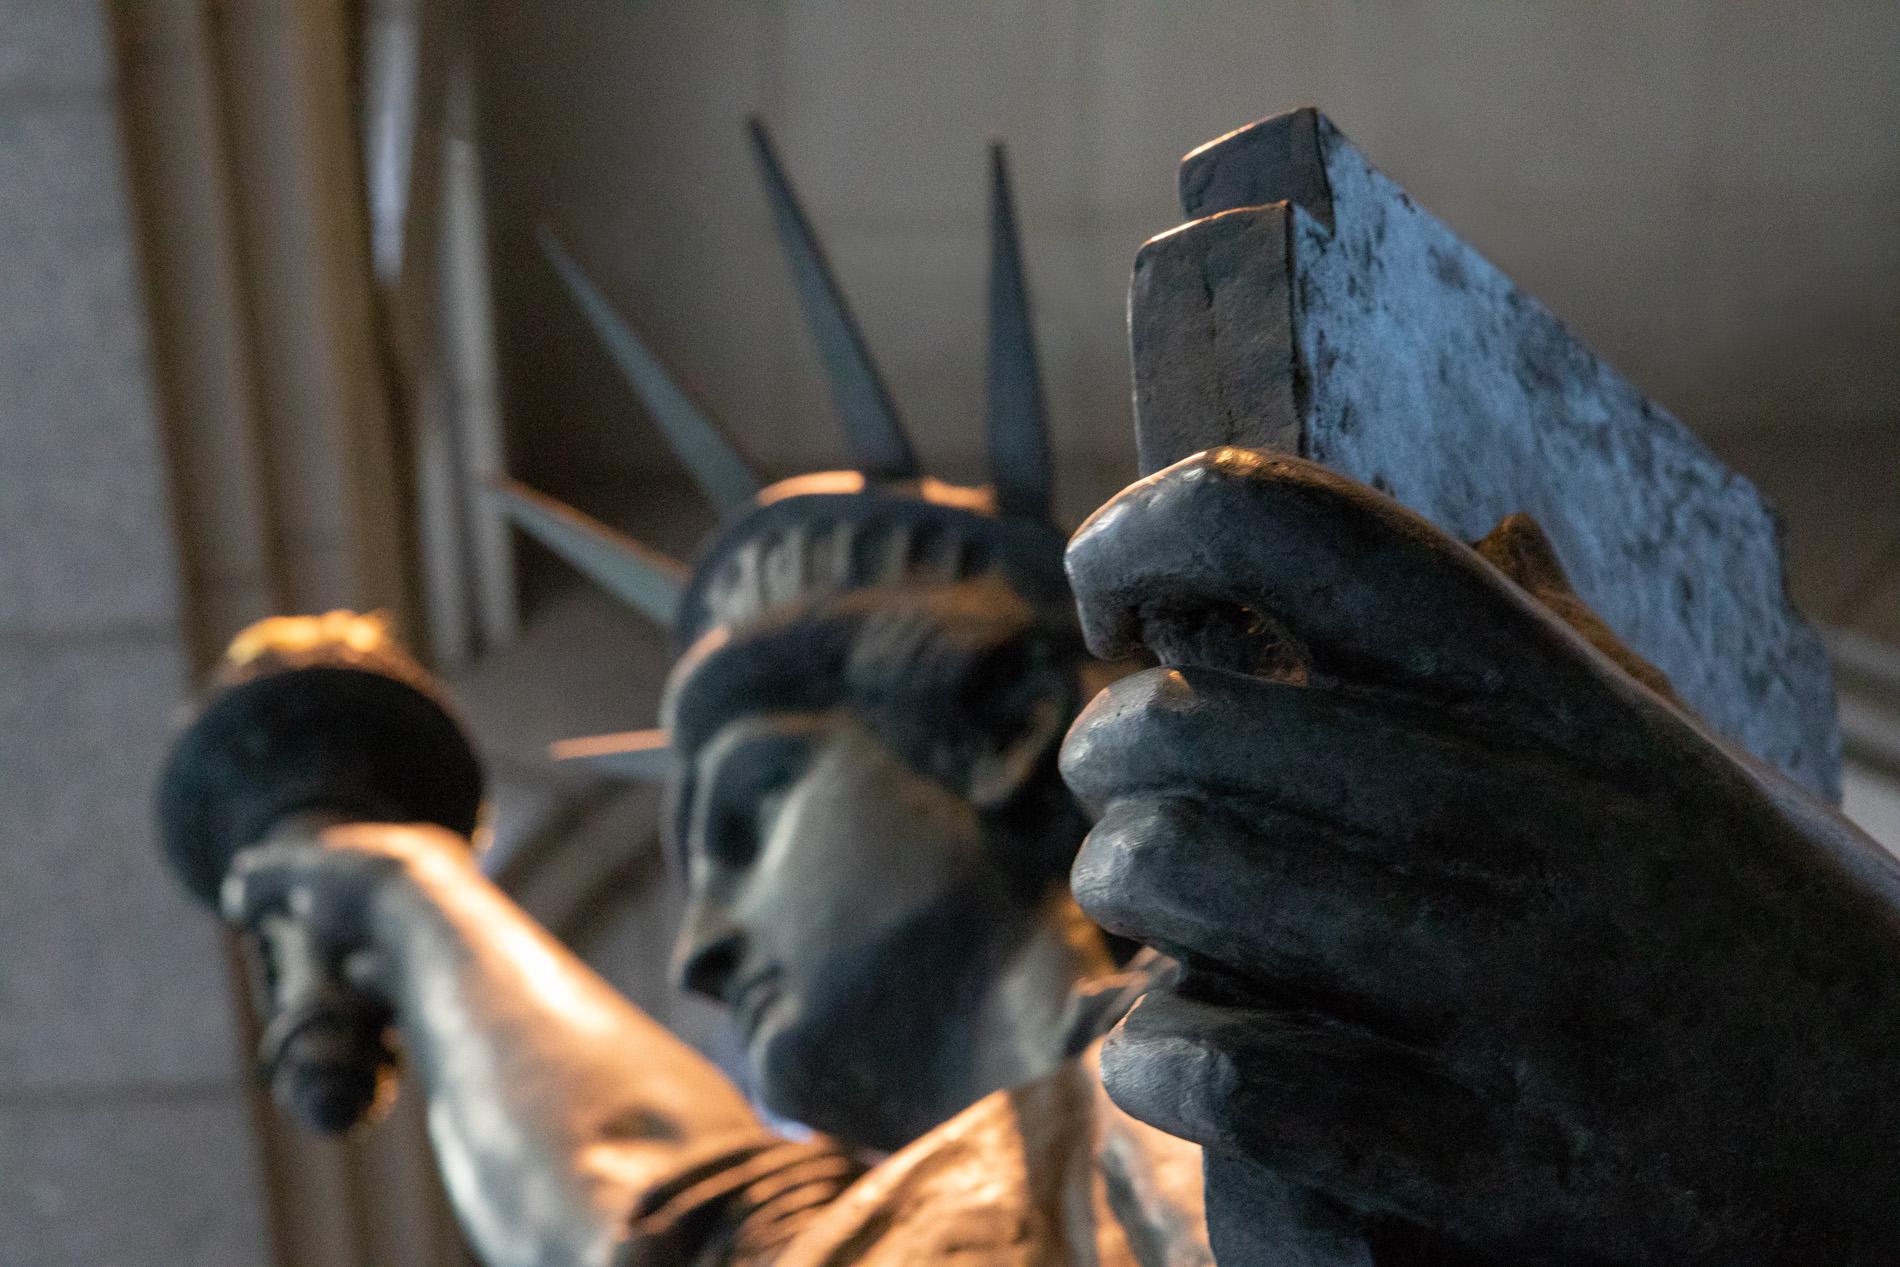 lady liberty - Liberty Enlightening the World